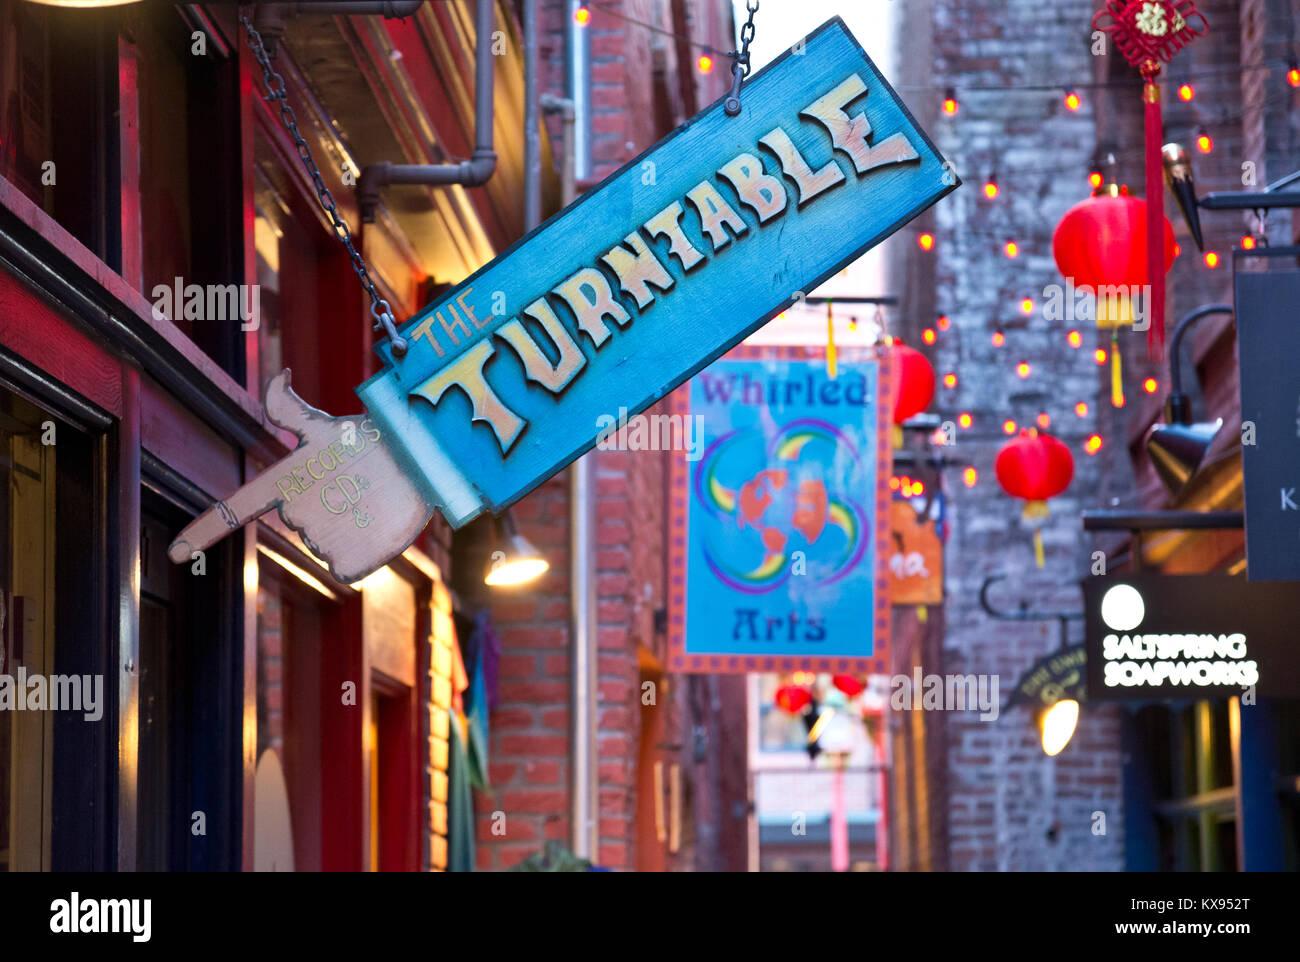 Unique Store Stock Photos Amp Unique Store Stock Images Alamy